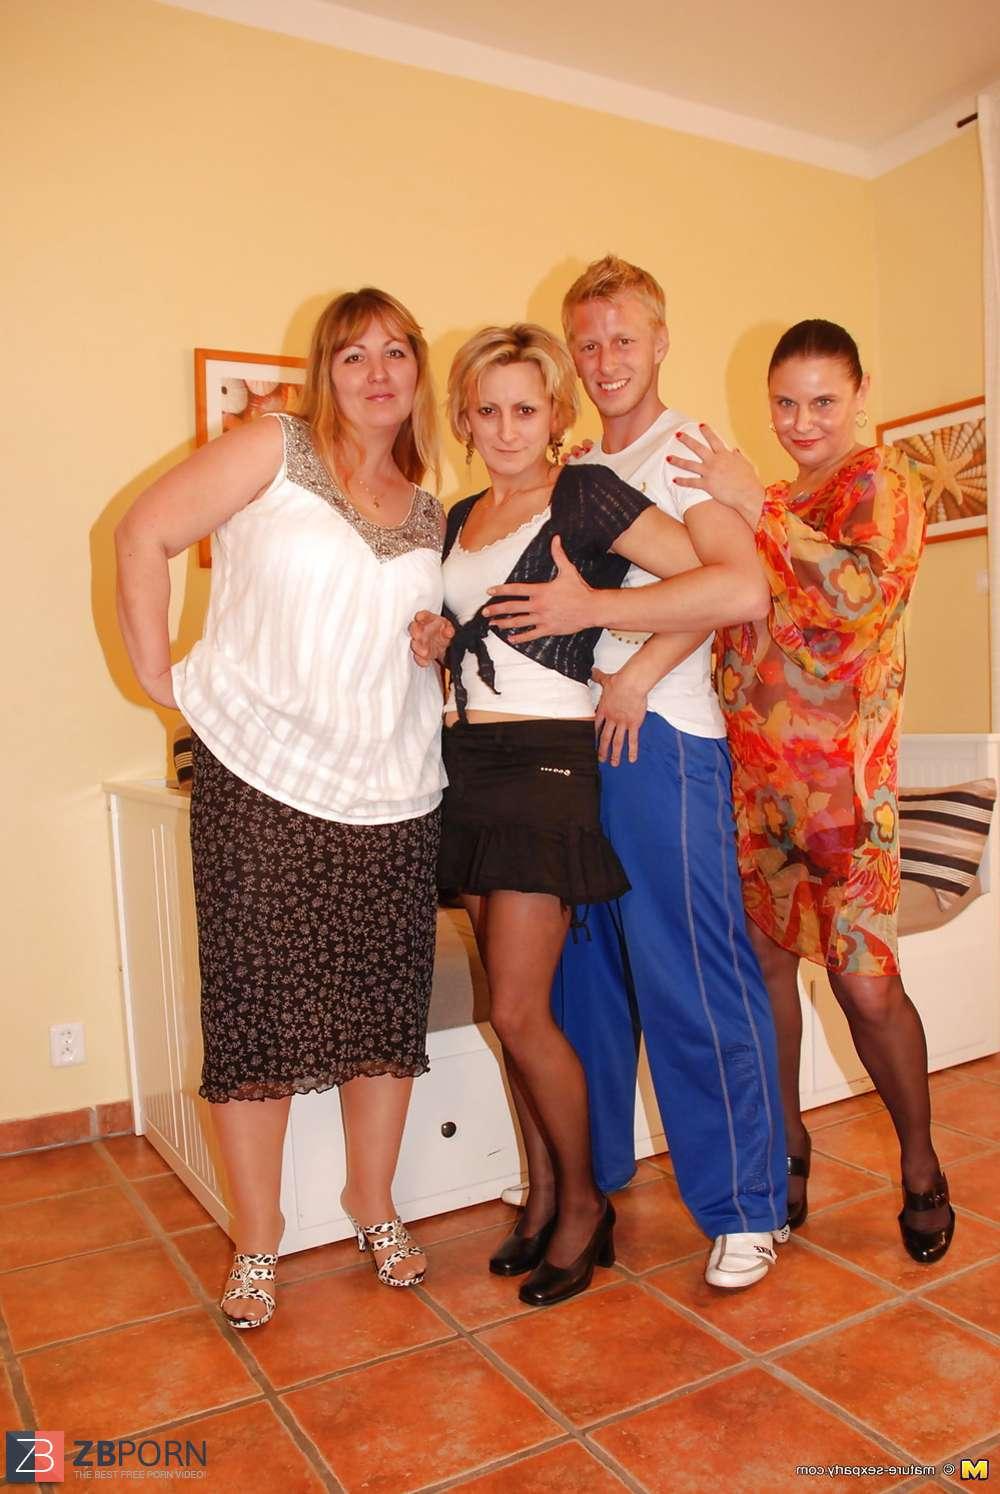 Mature sexparty photossangle sur la @todorazor.com